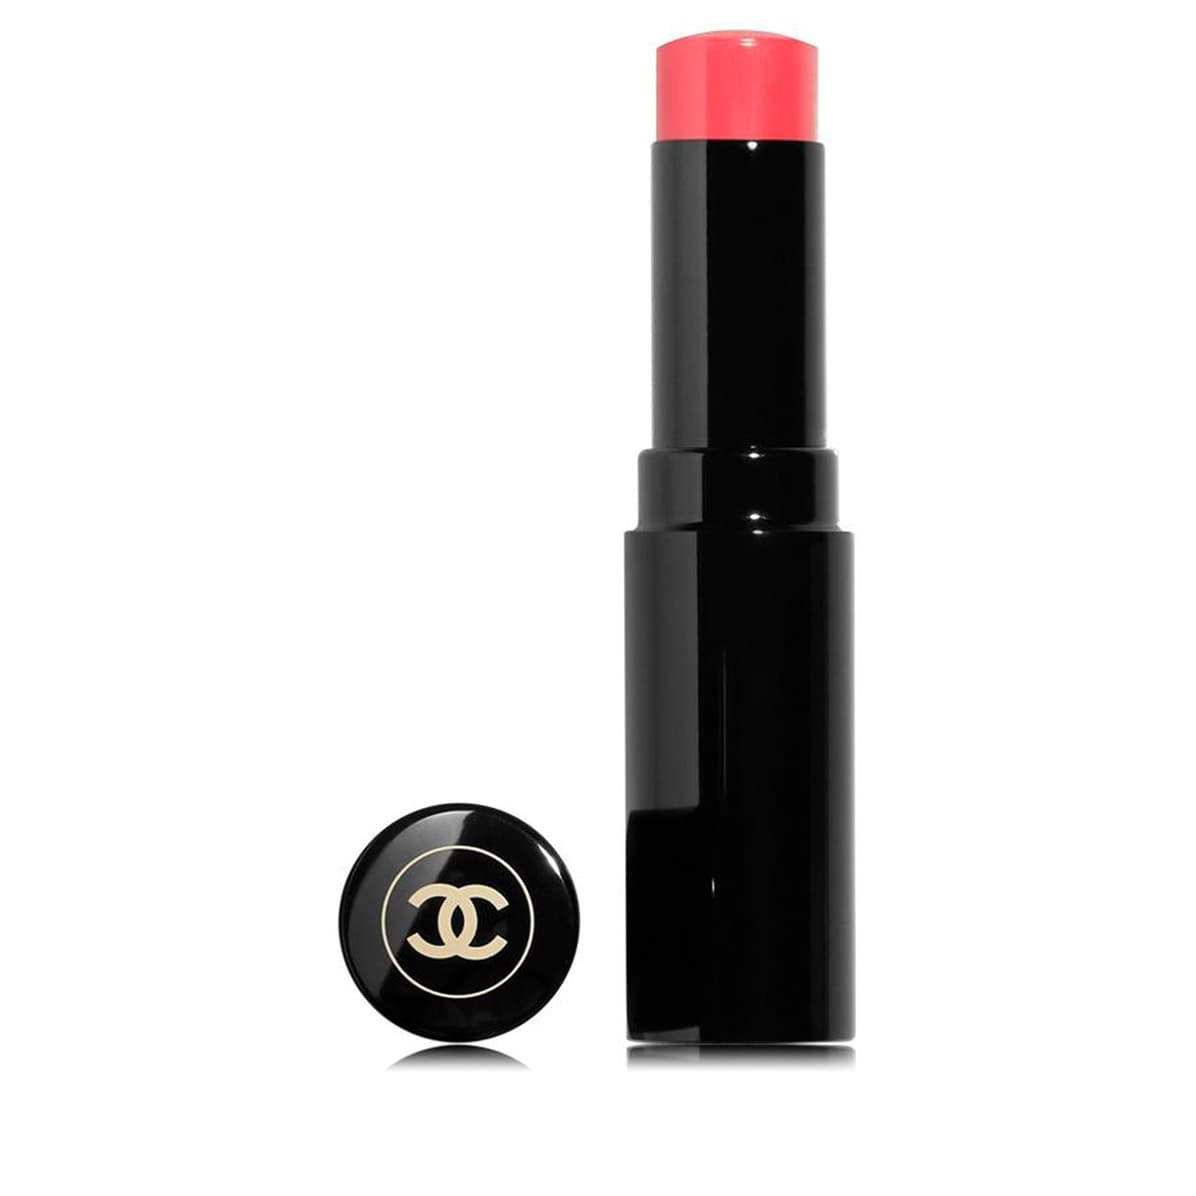 Chanel Les Beiges Healthy Glow Lip Balm Light